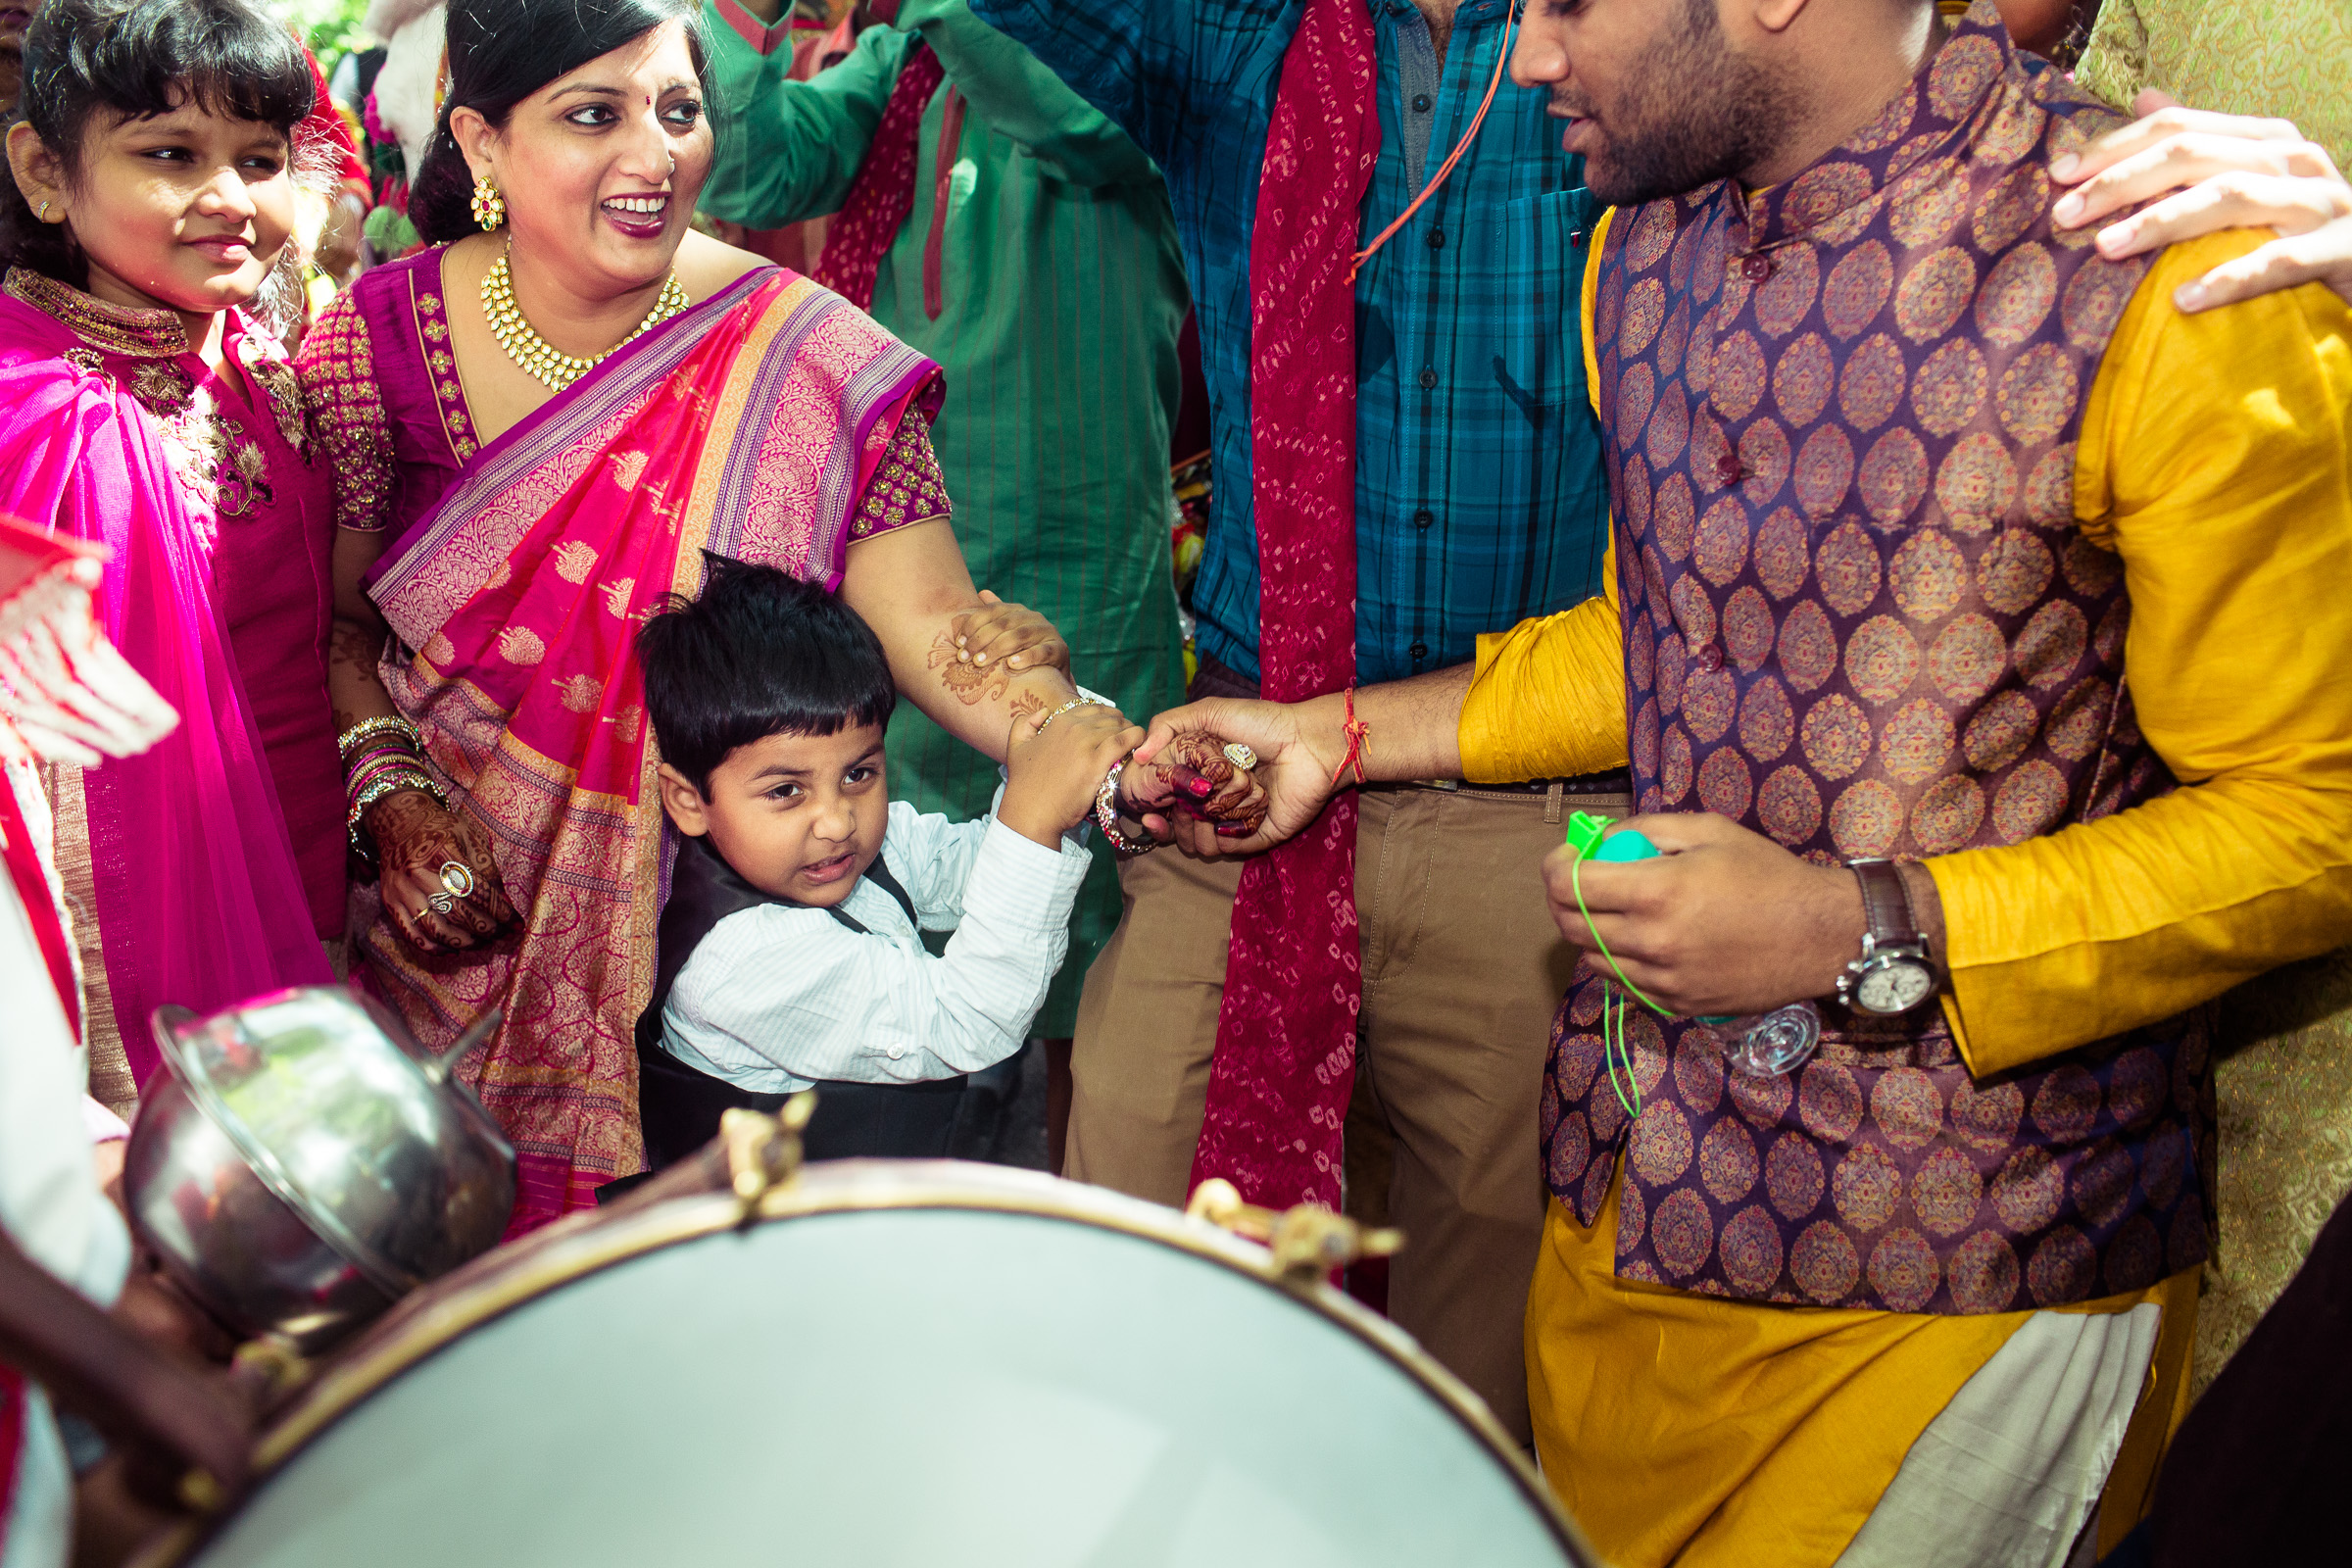 marwari-candid-wedding-photographers-bangalore-0022.jpg